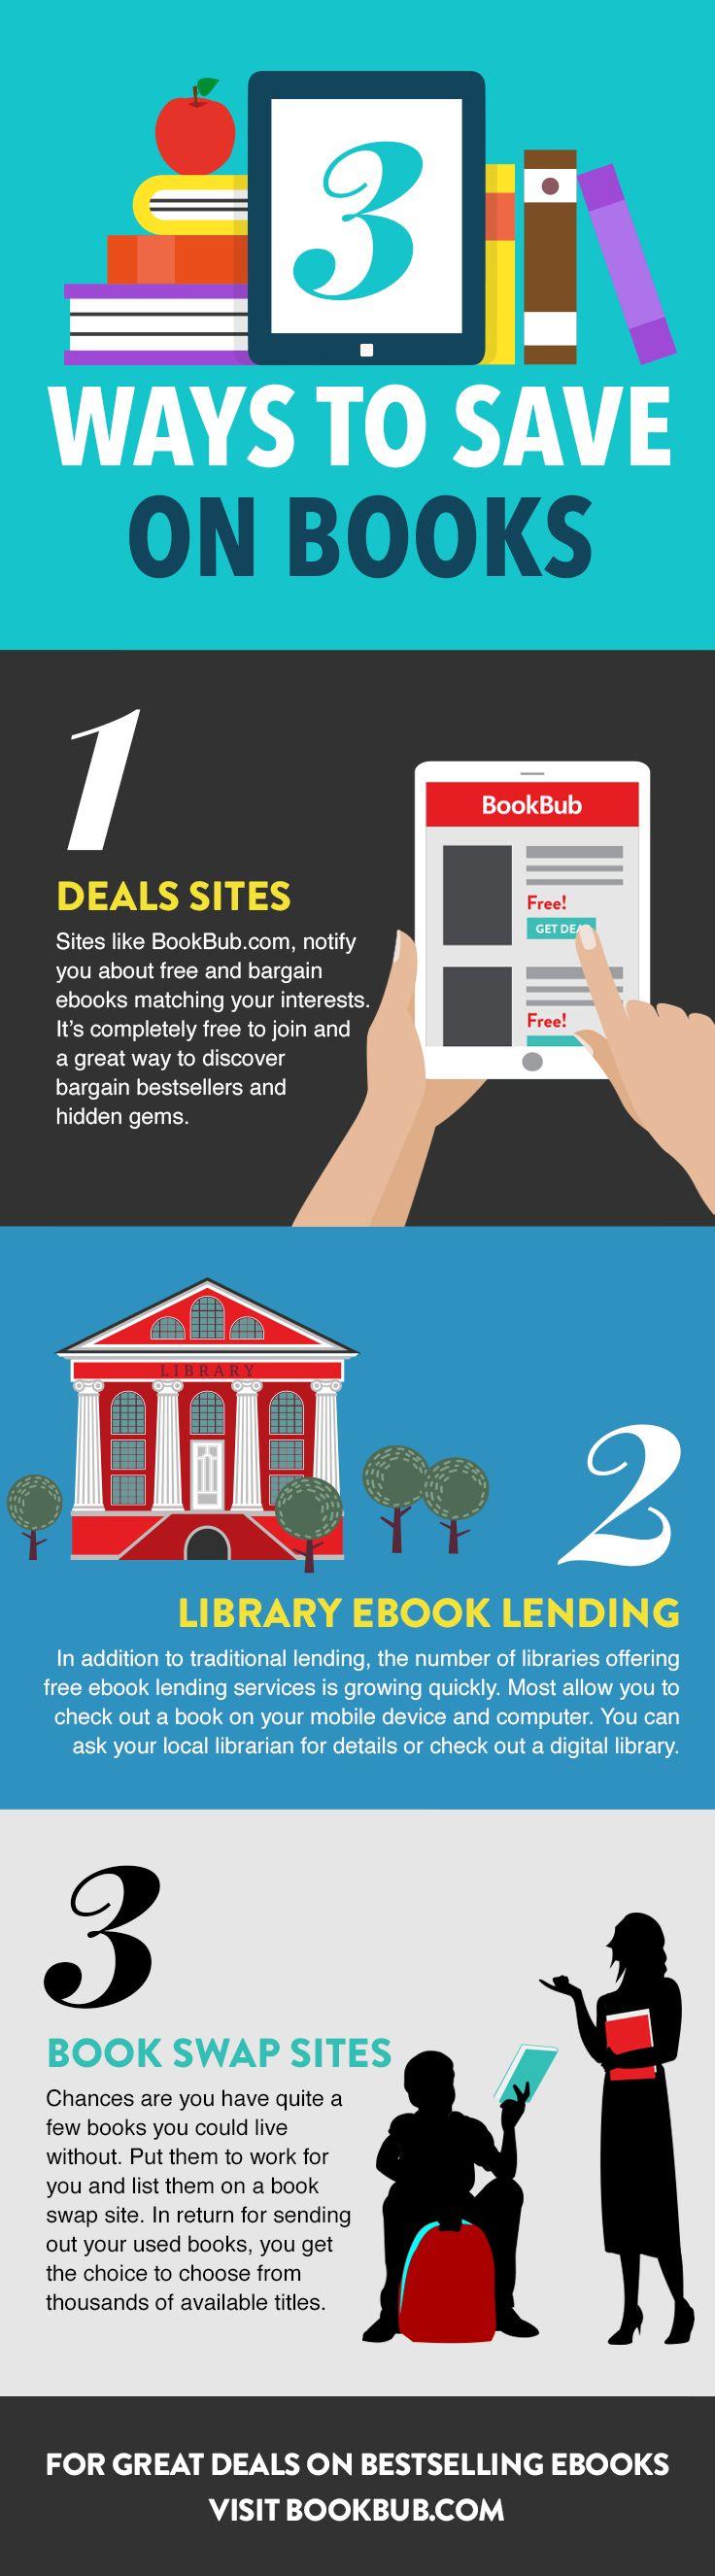 Bookbub: Free Ebooks  Great Deals On Bestsellers You'll Love